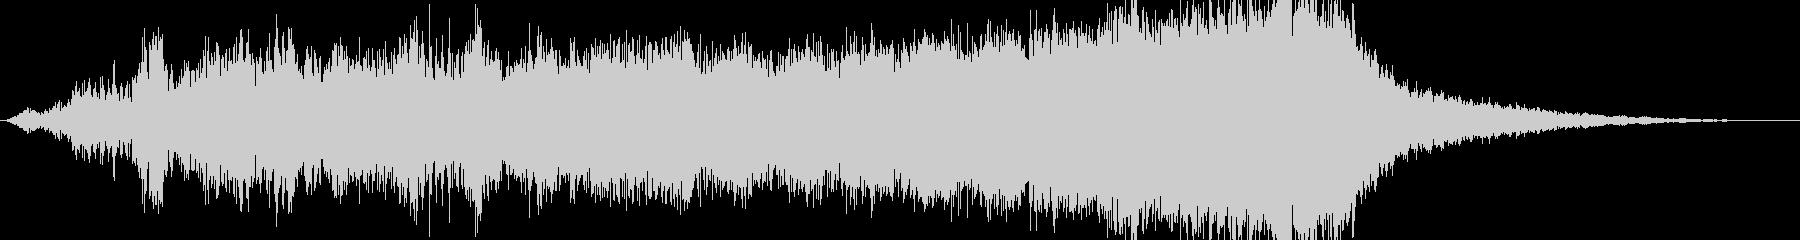 CINEMATIC RISER_41の未再生の波形